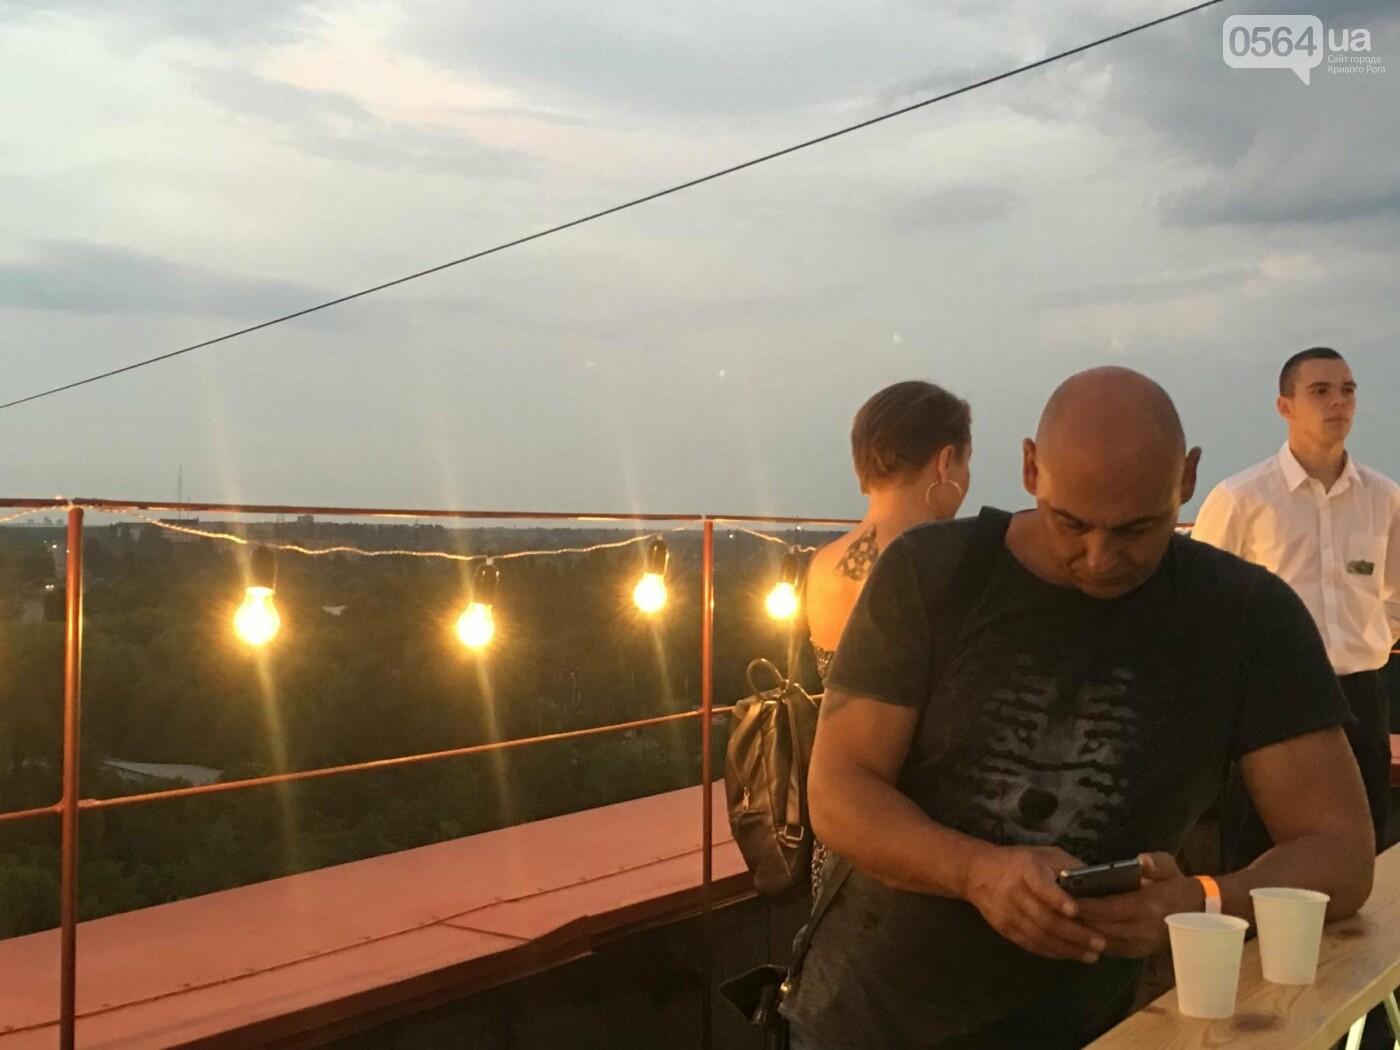 Сотни криворожан встречали закат на крыше отеля под мелодии джаза, - ФОТО, ВИДЕО, фото-13